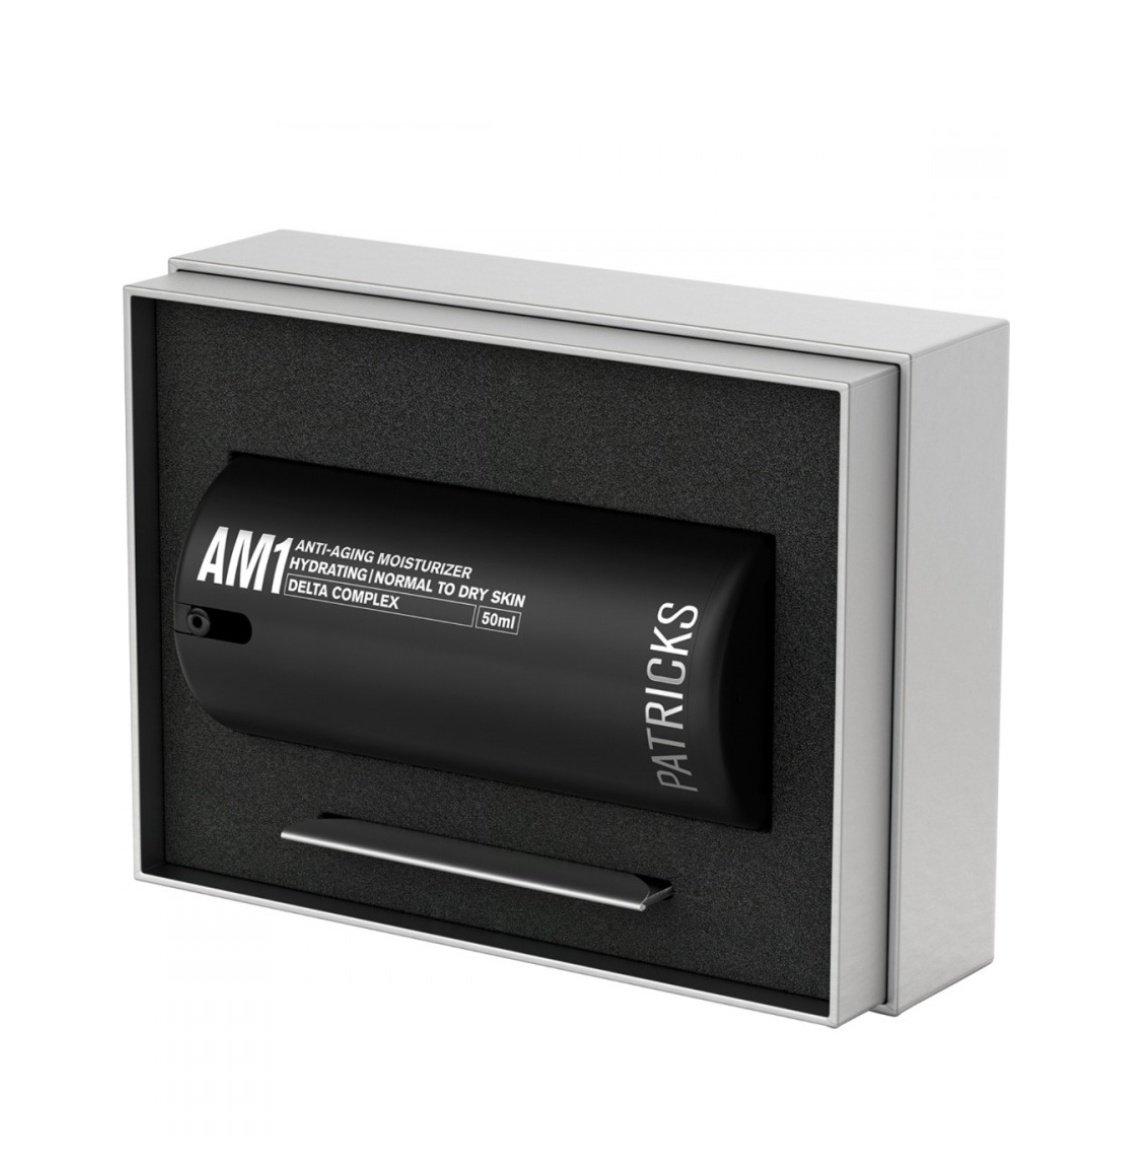 Patricks AM1 Anti-Aging Moisturizer 50ml